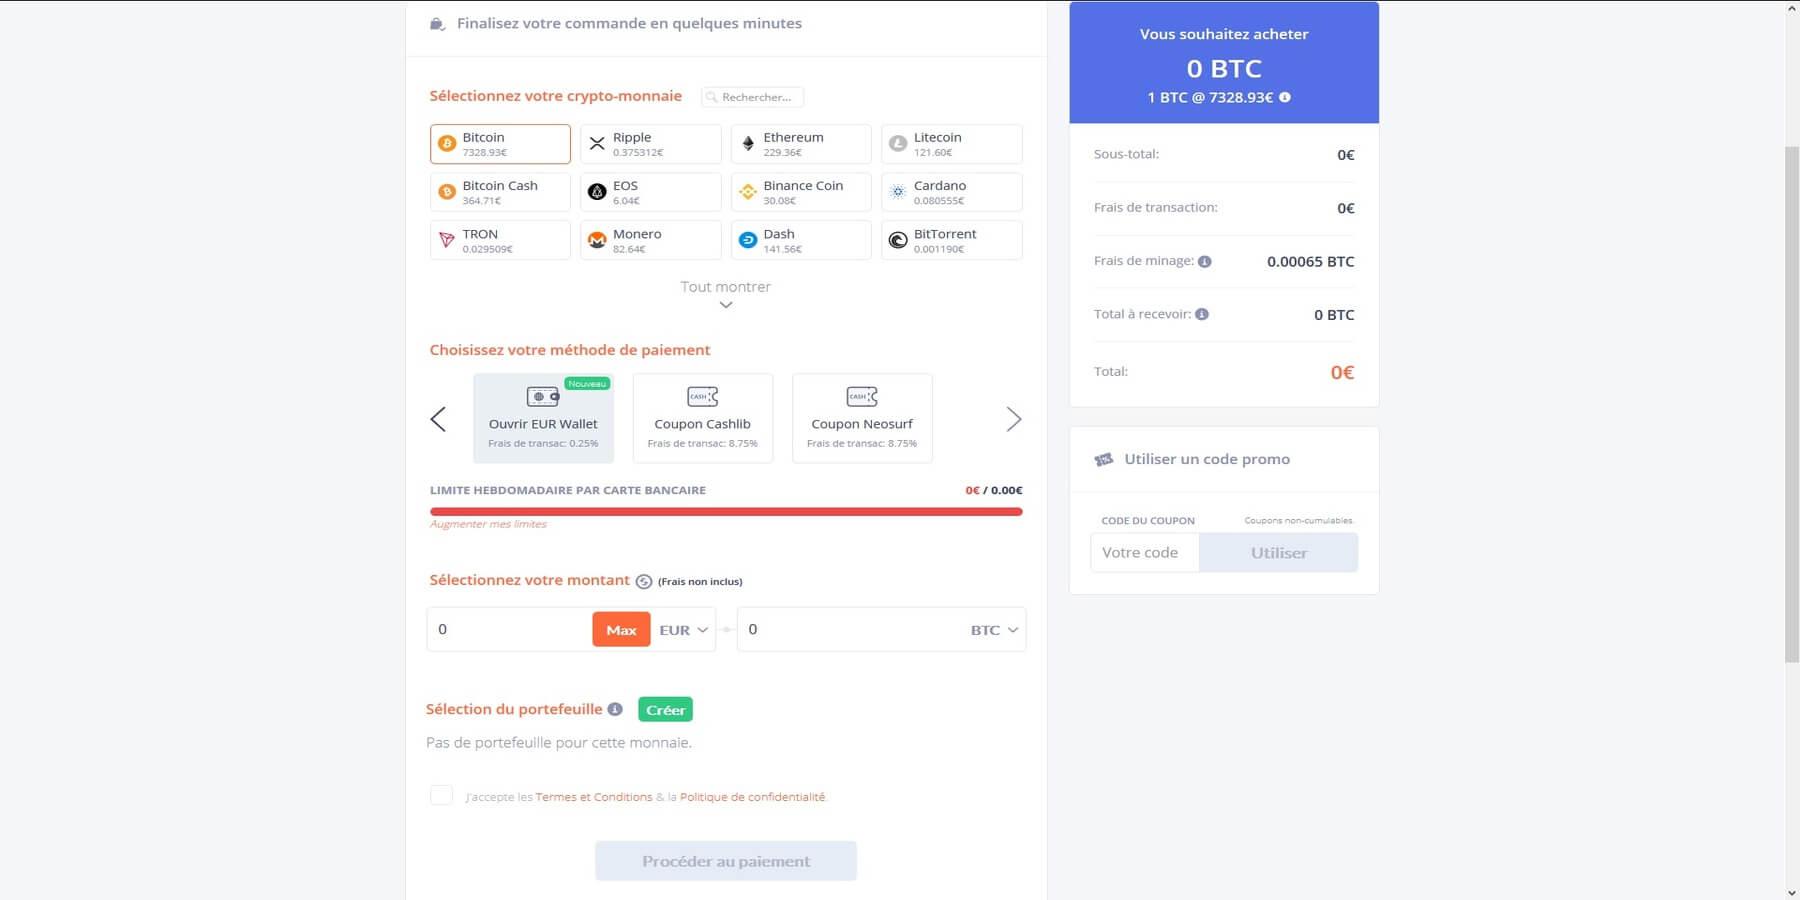 Etape 4: Acheter les Bitcoin